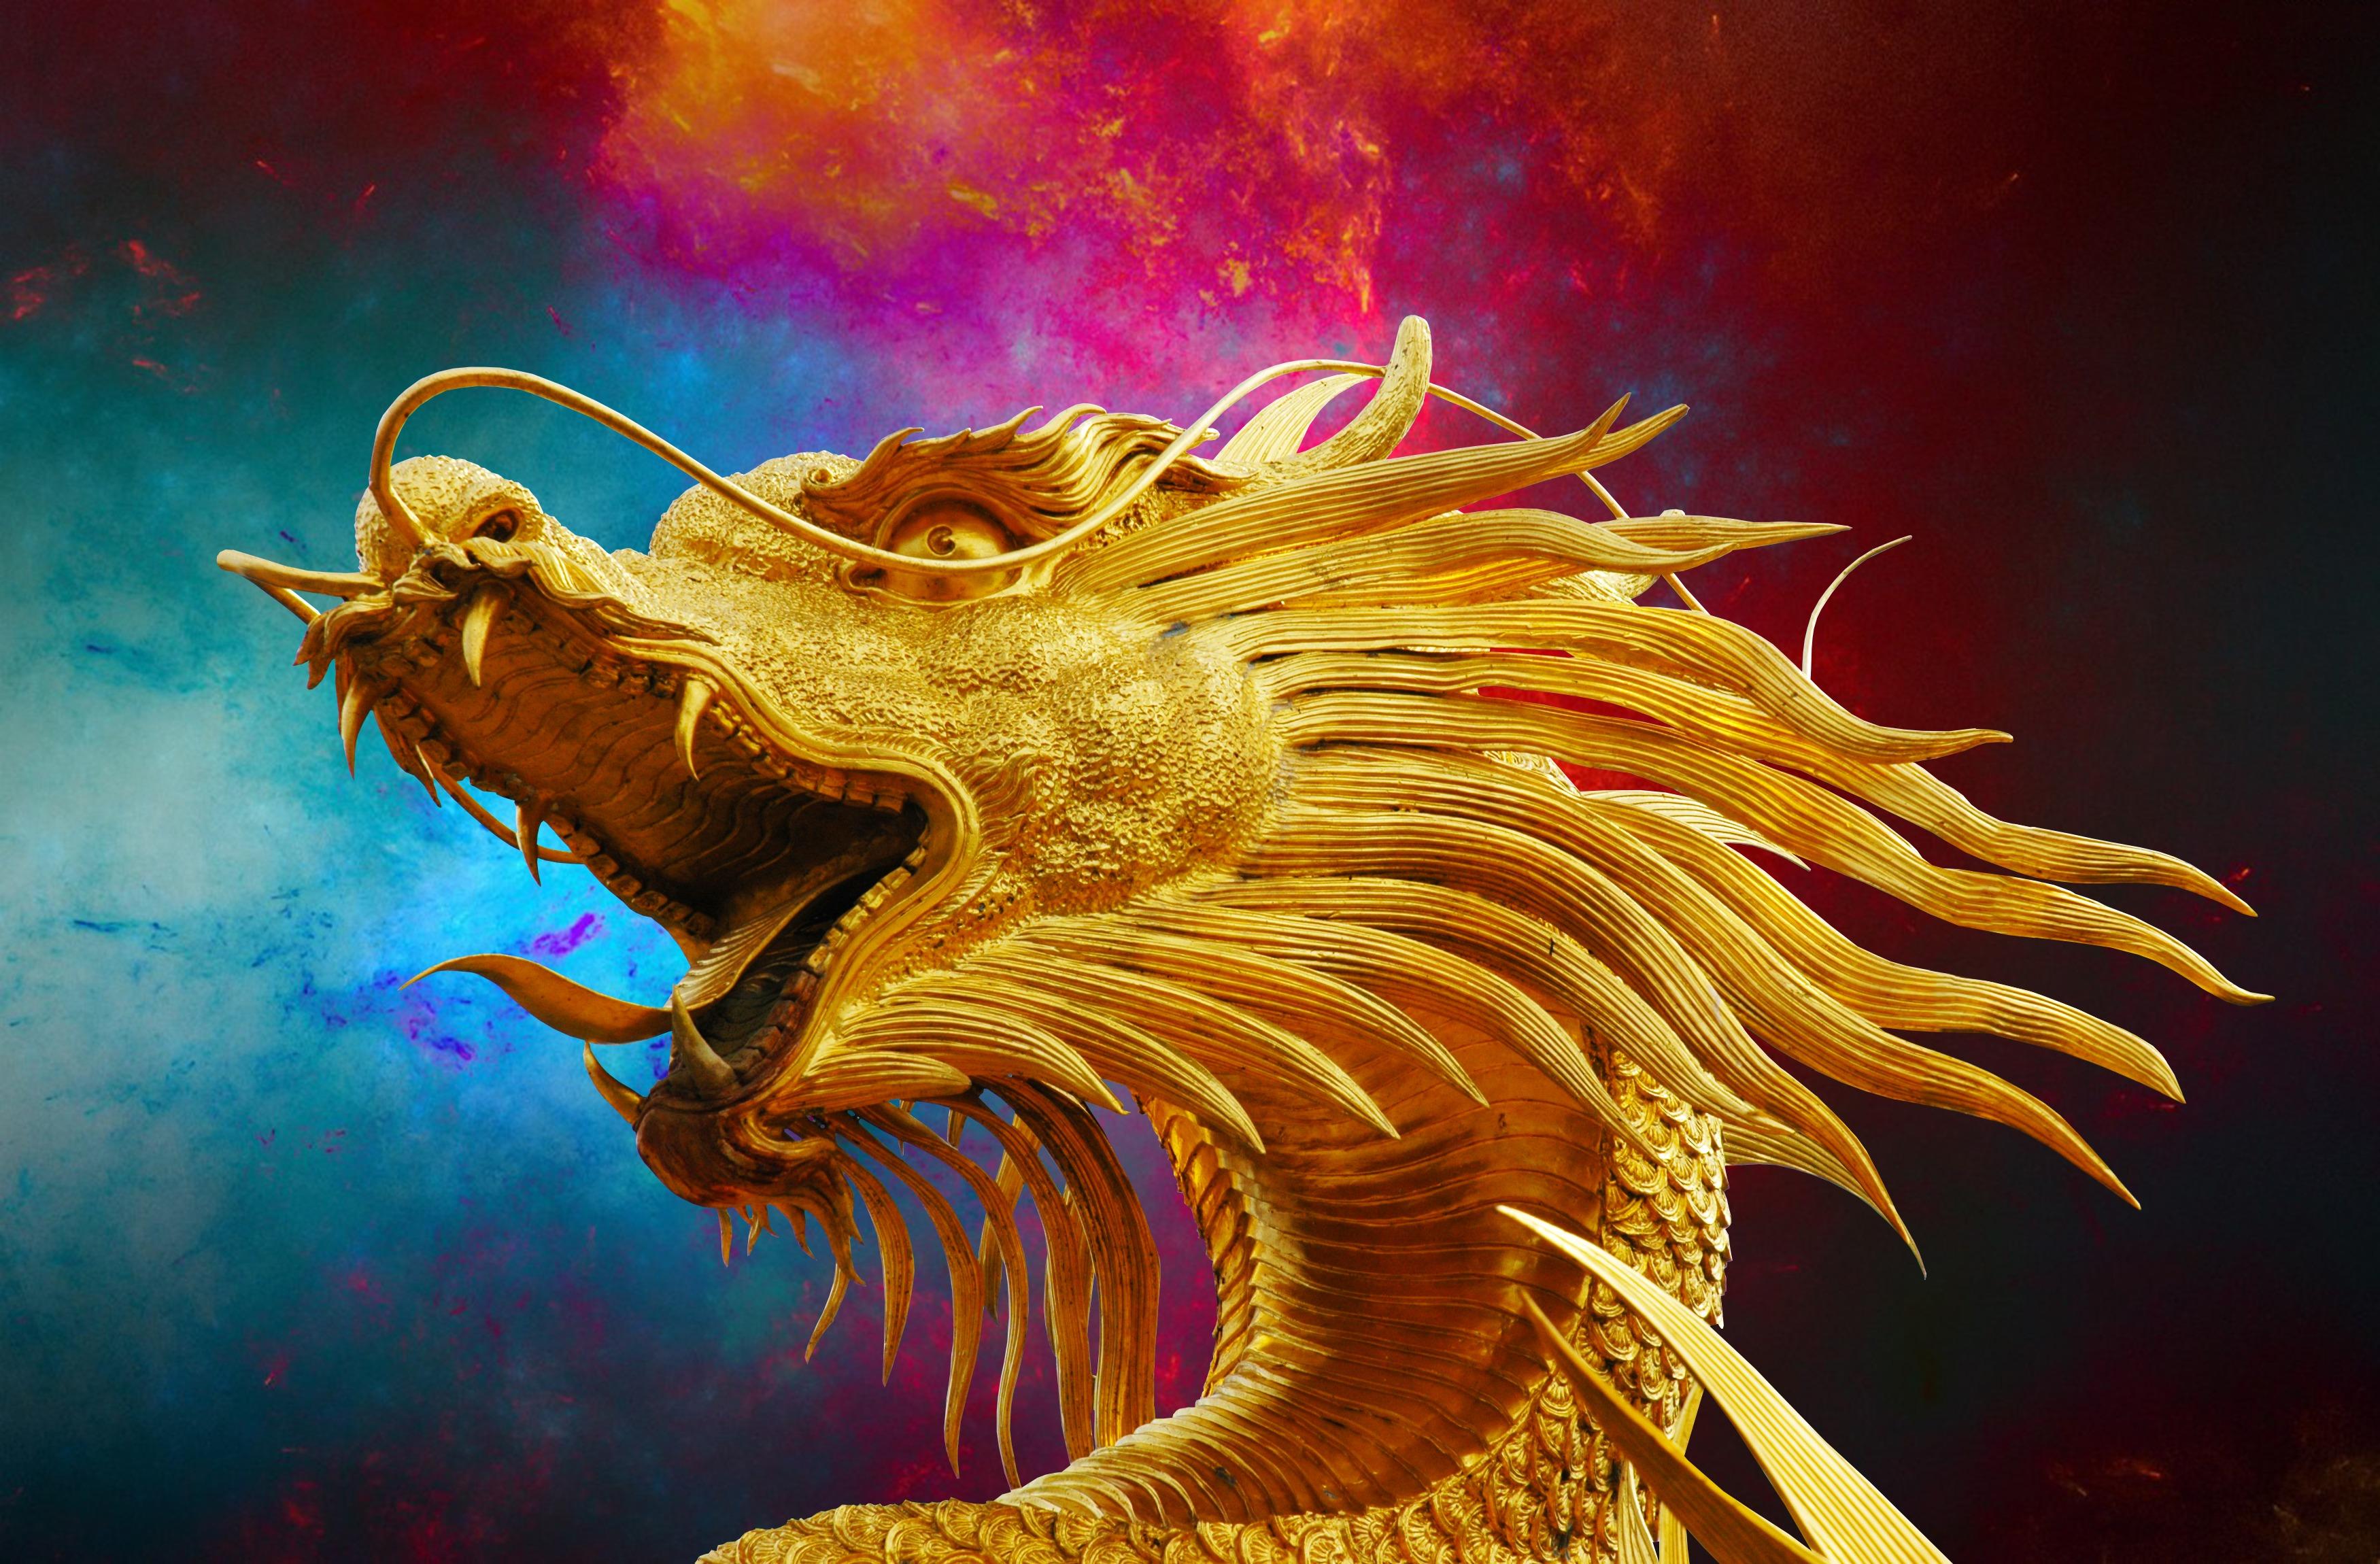 images feng shui - lefengshuifacile.com - dragon fezng shui